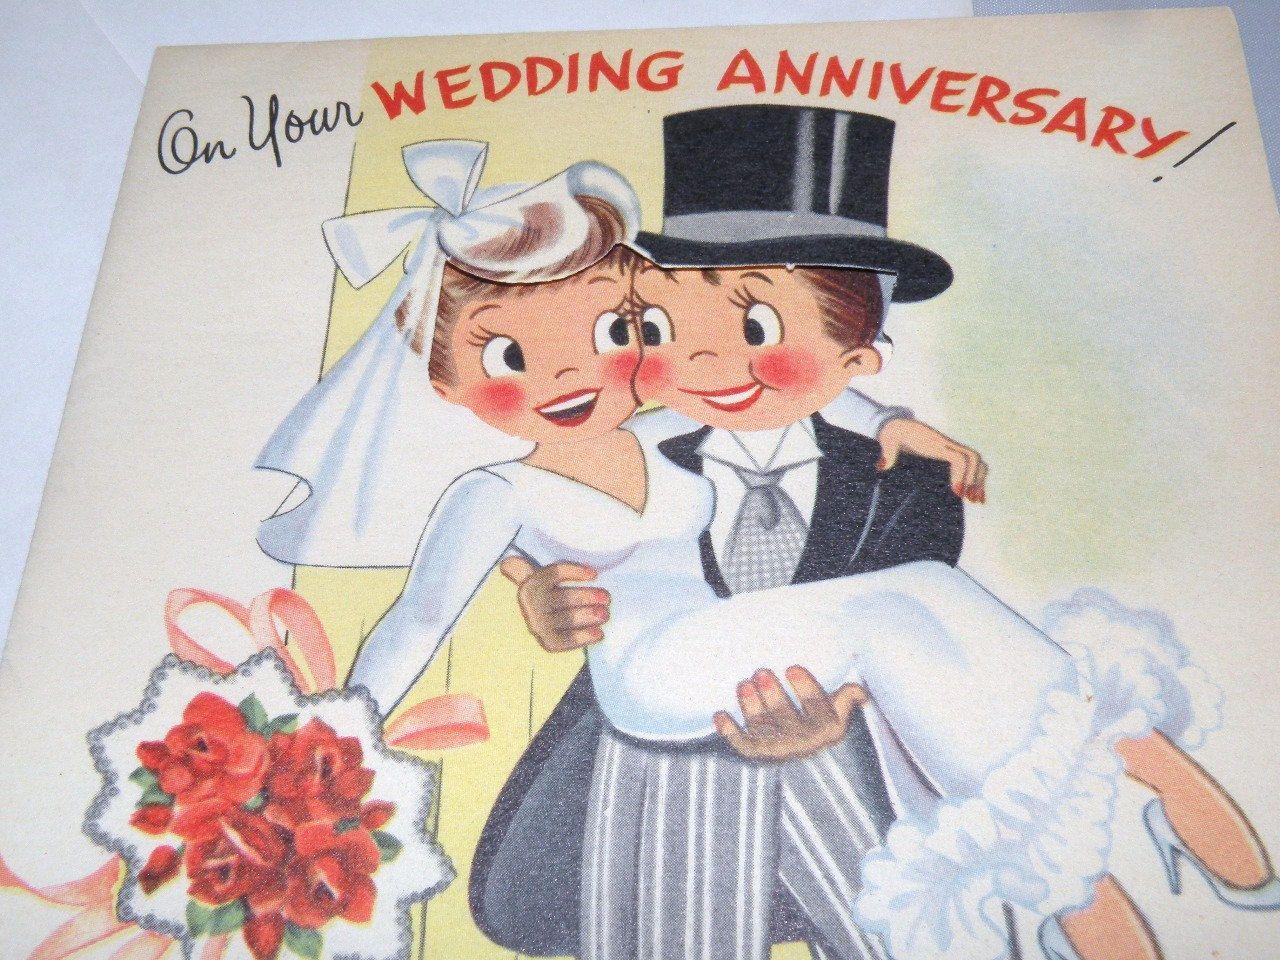 1940s wedding anniversary card unused with envelope